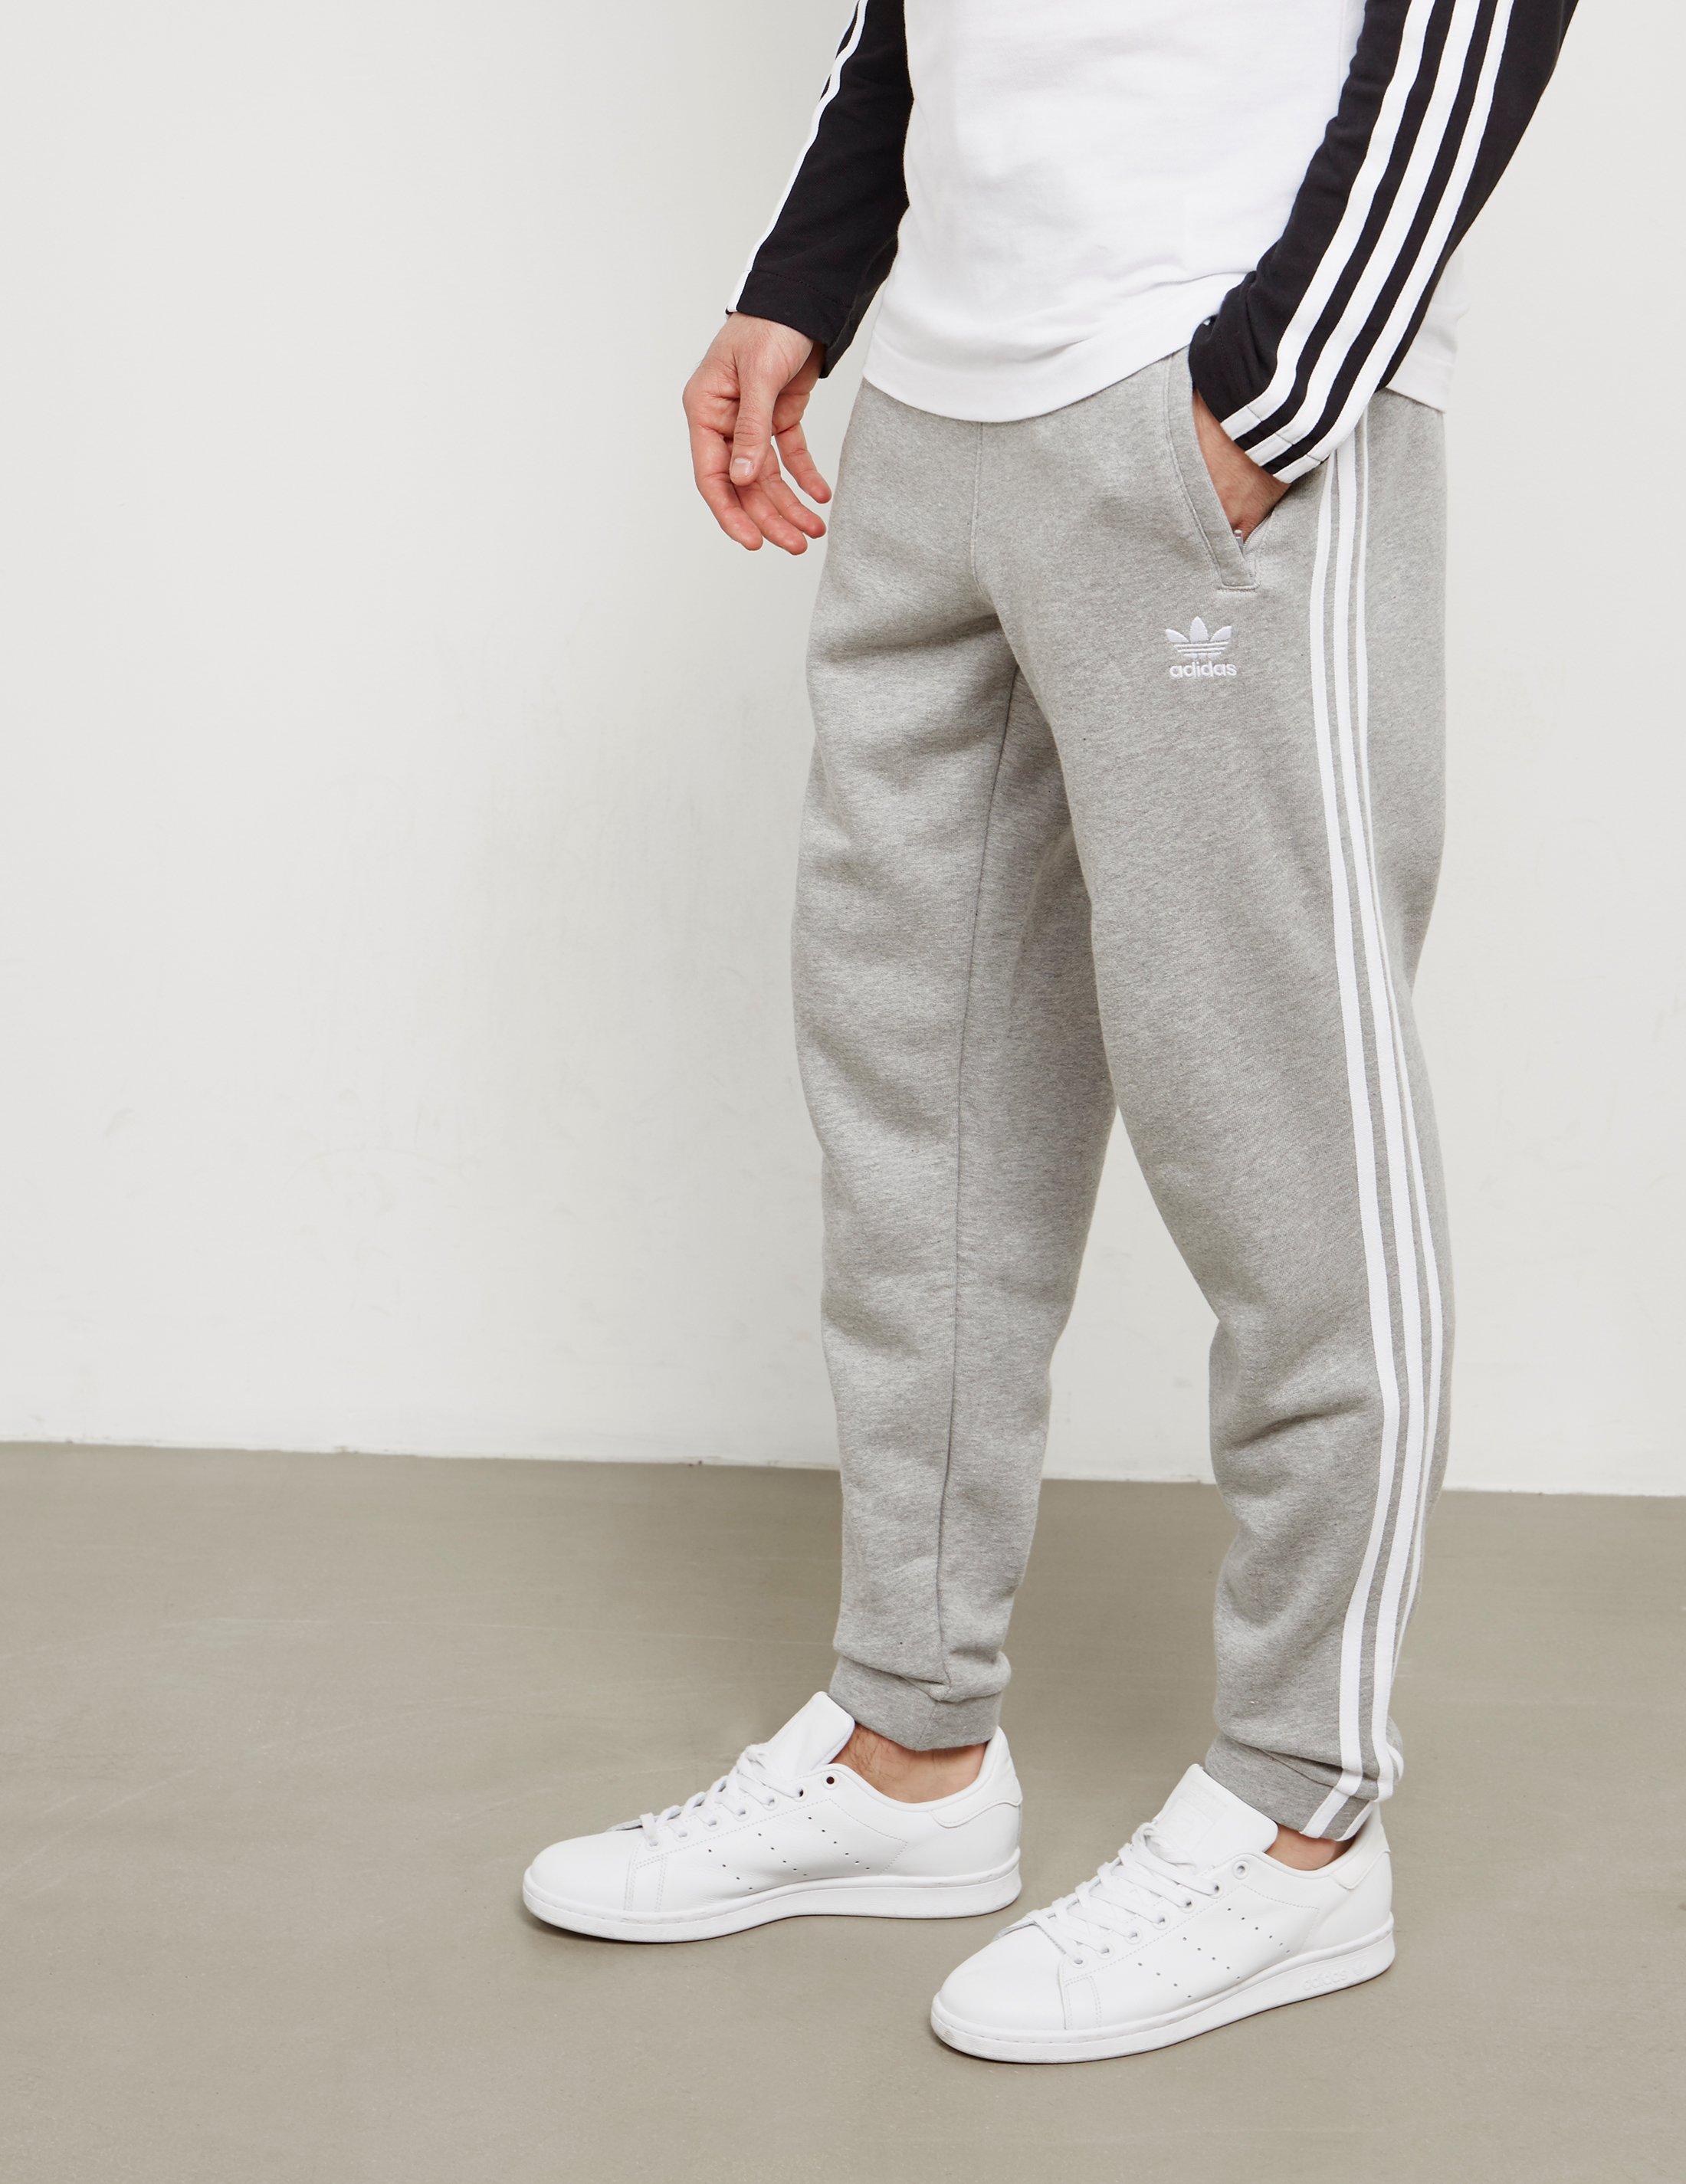 Lyst - adidas Originals Mens Trefoil Fleece Track Pants Grey in Gray ... 11072b92d